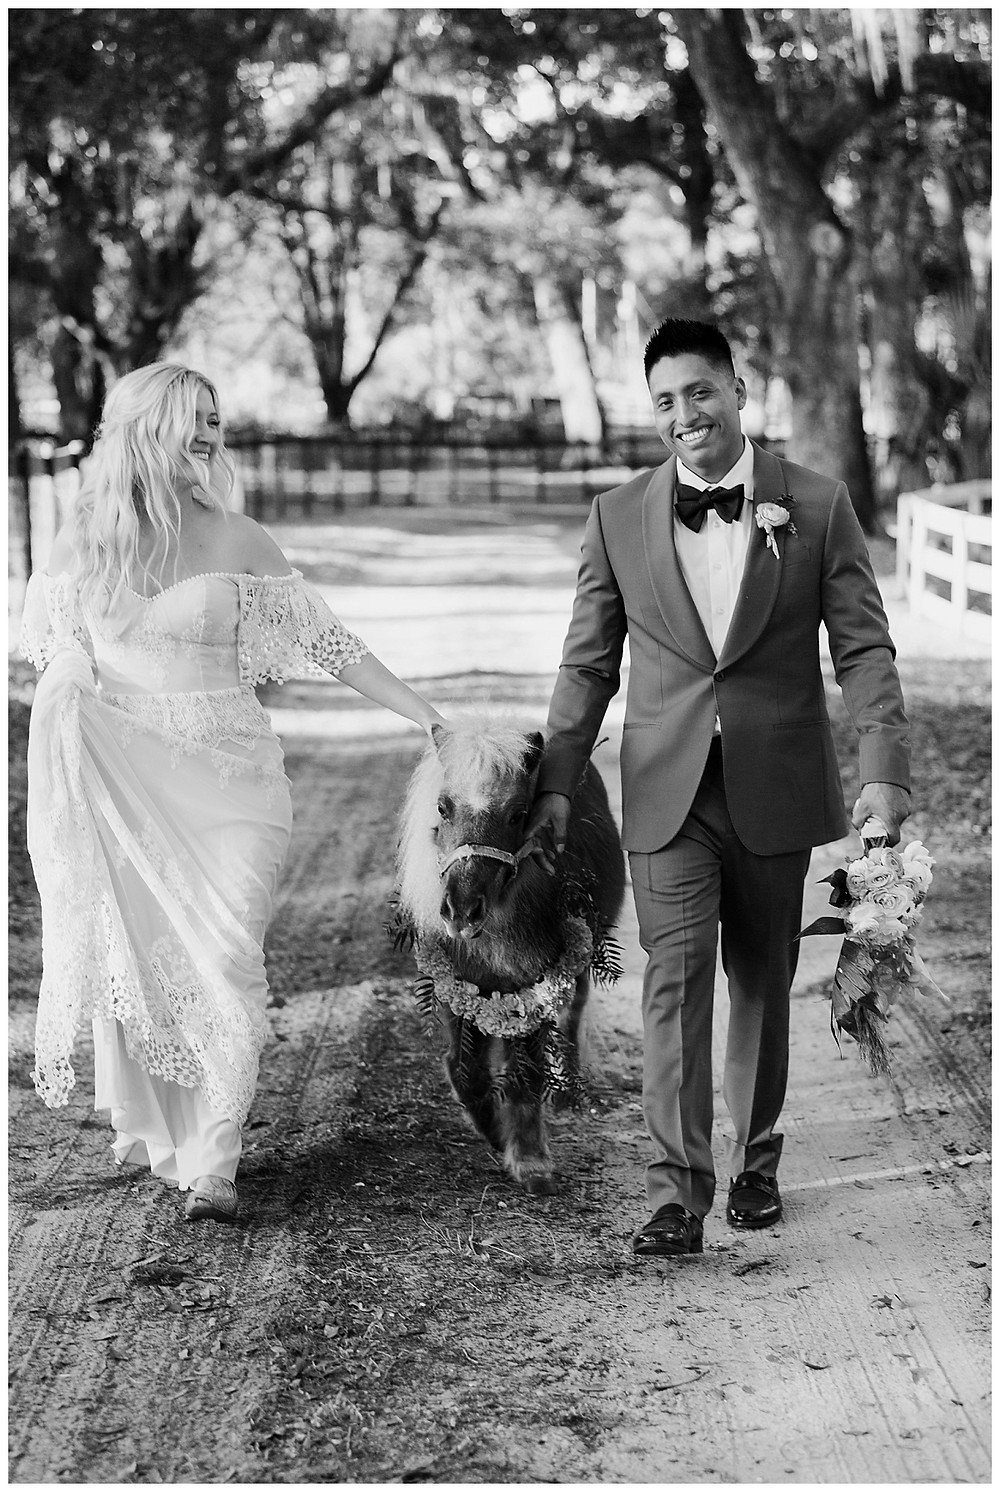 Boho Bride & Groom Portraits with Mini Horse at Enchanted Oaks Farms, Ocala Florida